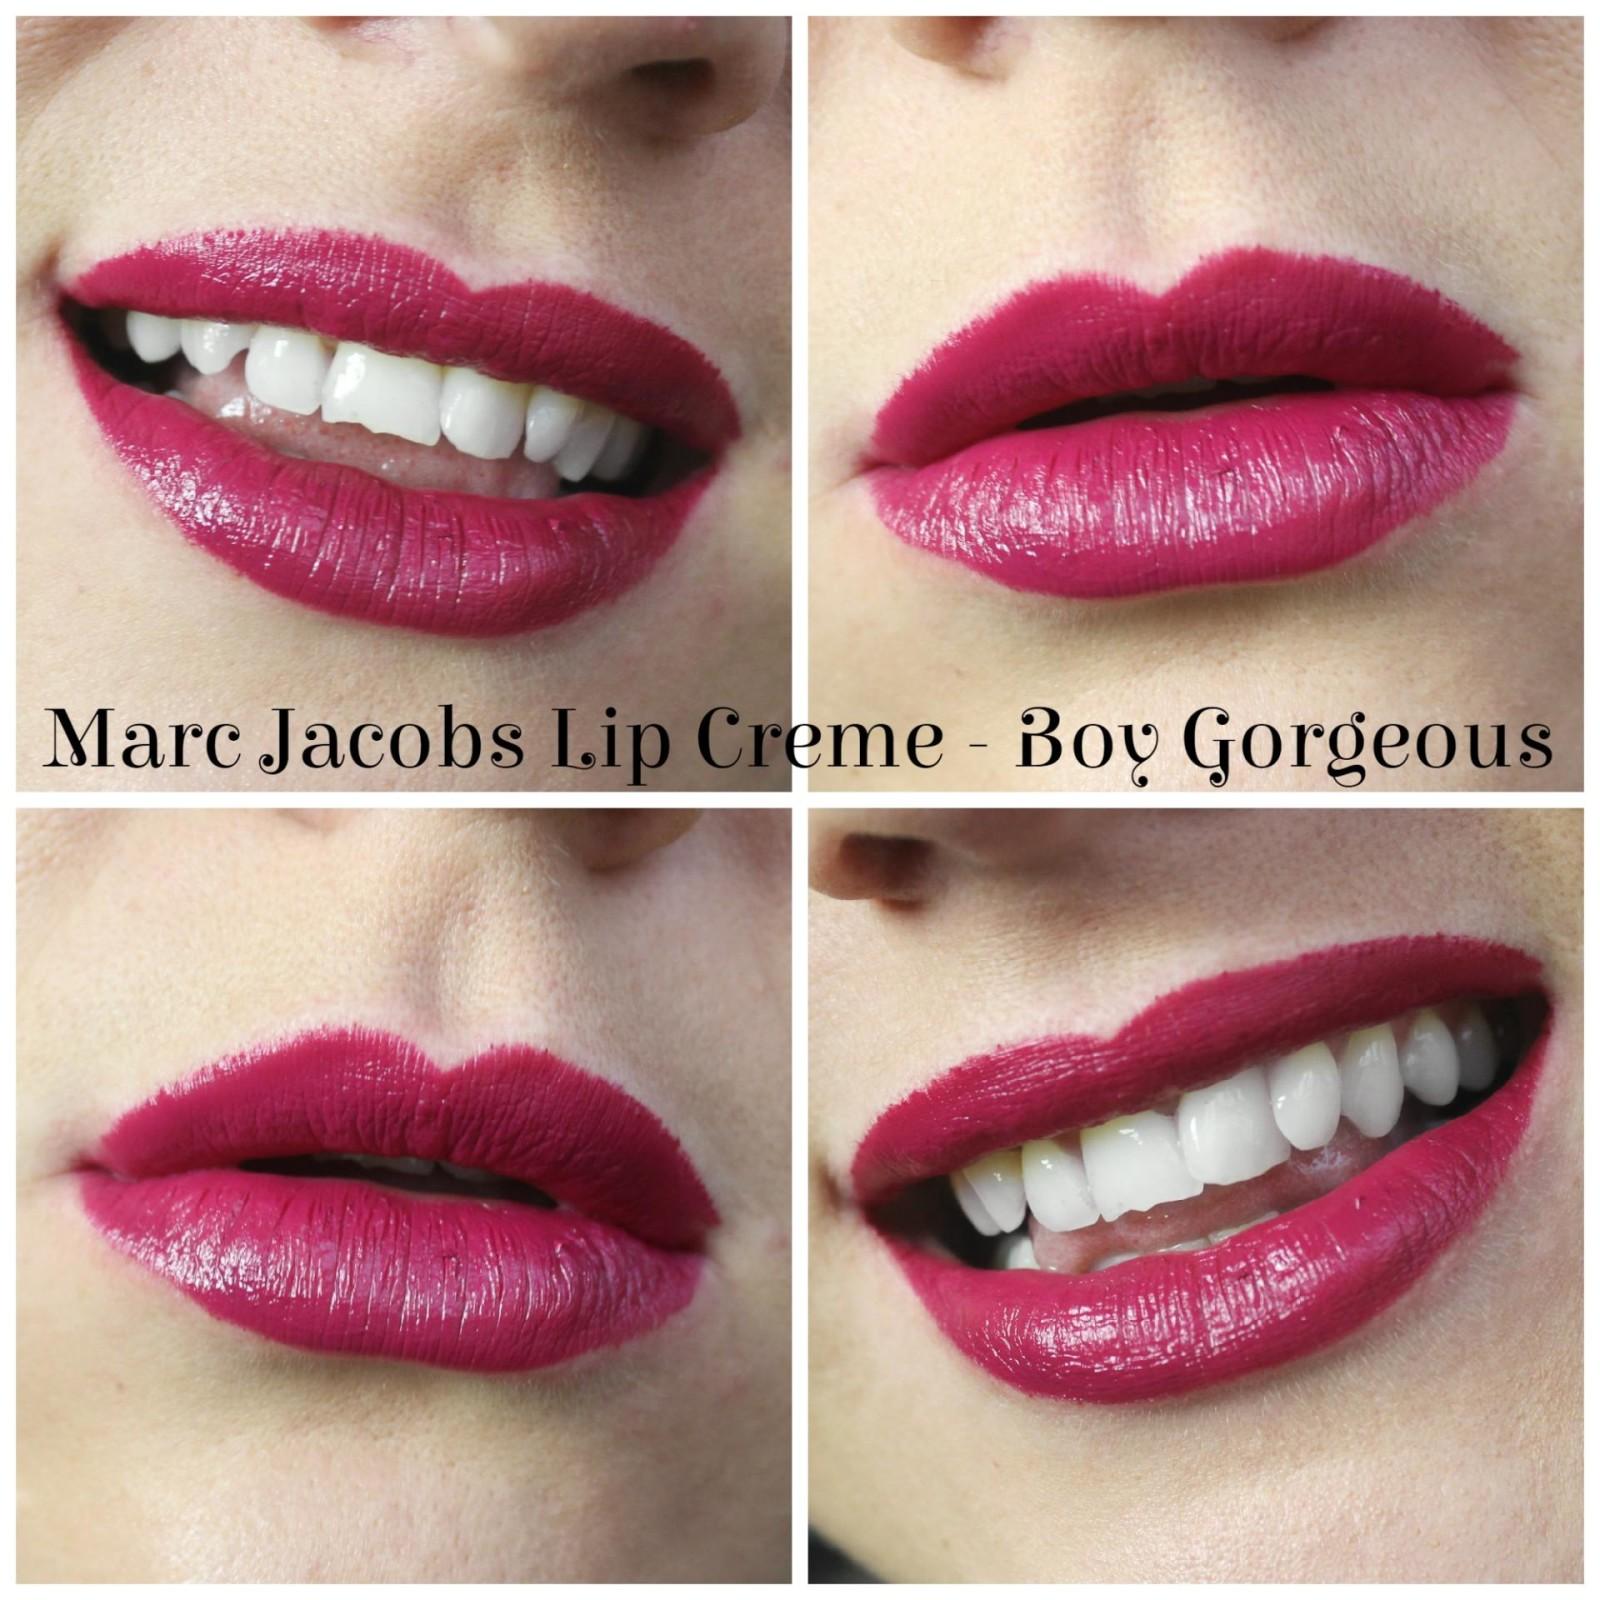 Marc Jacobs The Sofia Lip Set Boy Gorgeous